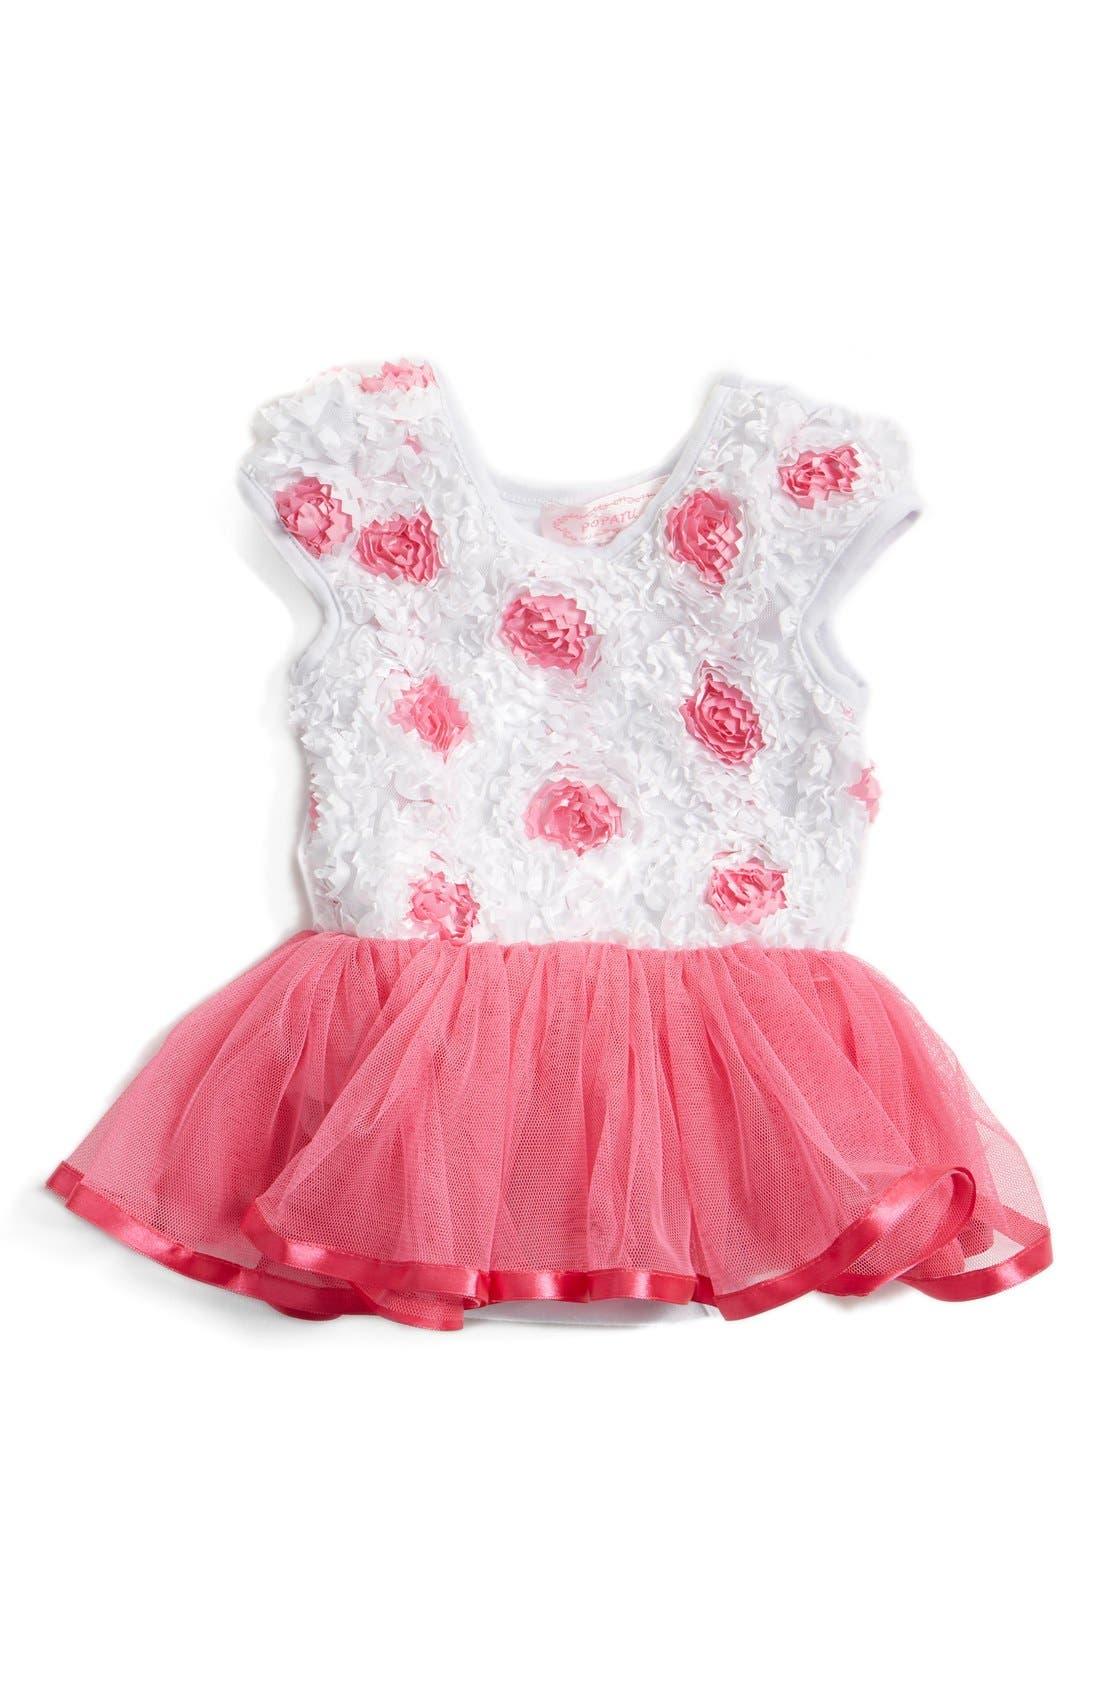 Main Image - Popatu Soutache Floral Tutu Dress (Baby Girls)